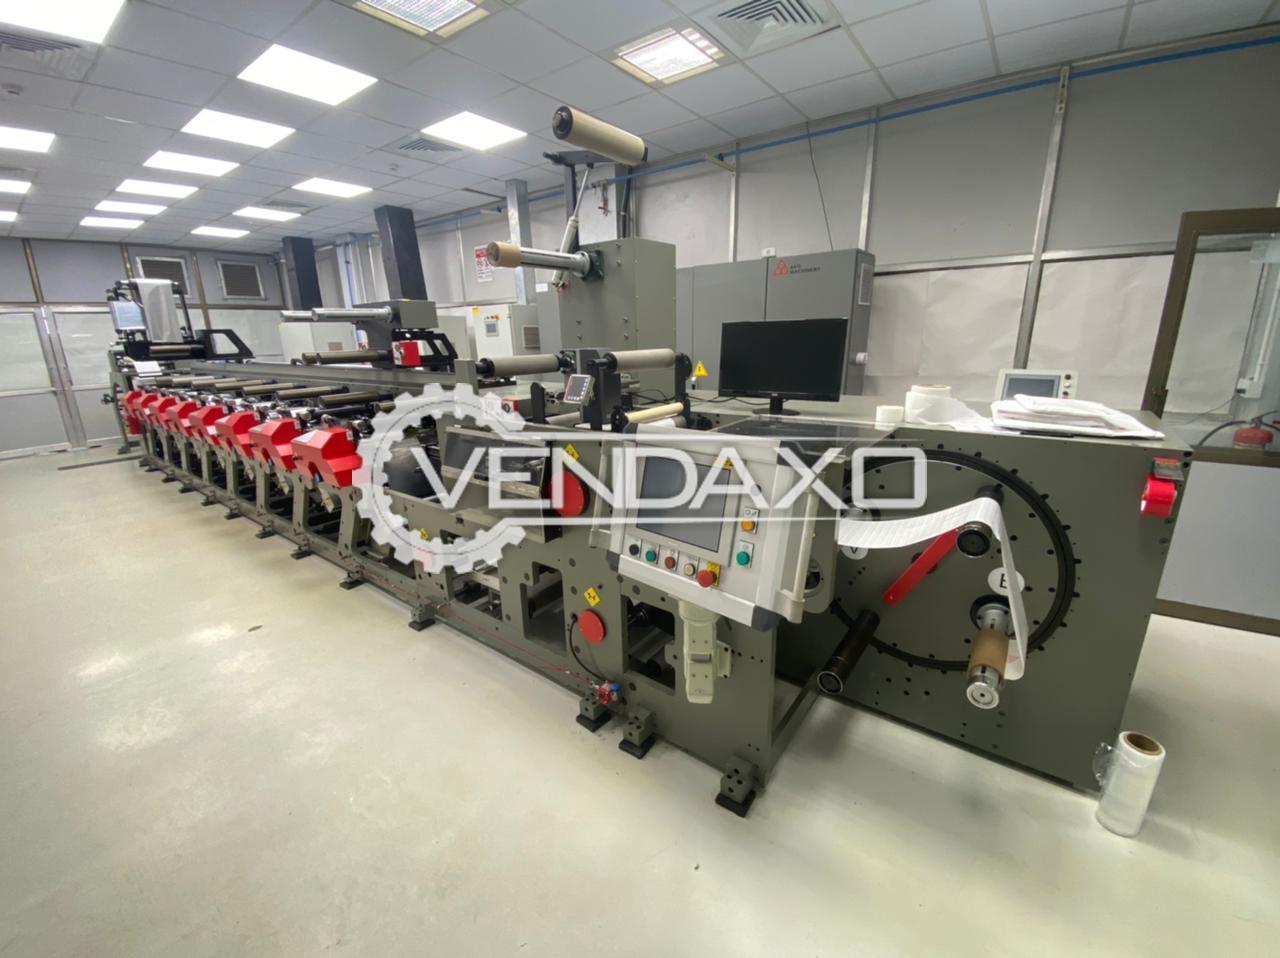 AKO Delta 330 Flexo Printing Press - 25 to 300 Microns